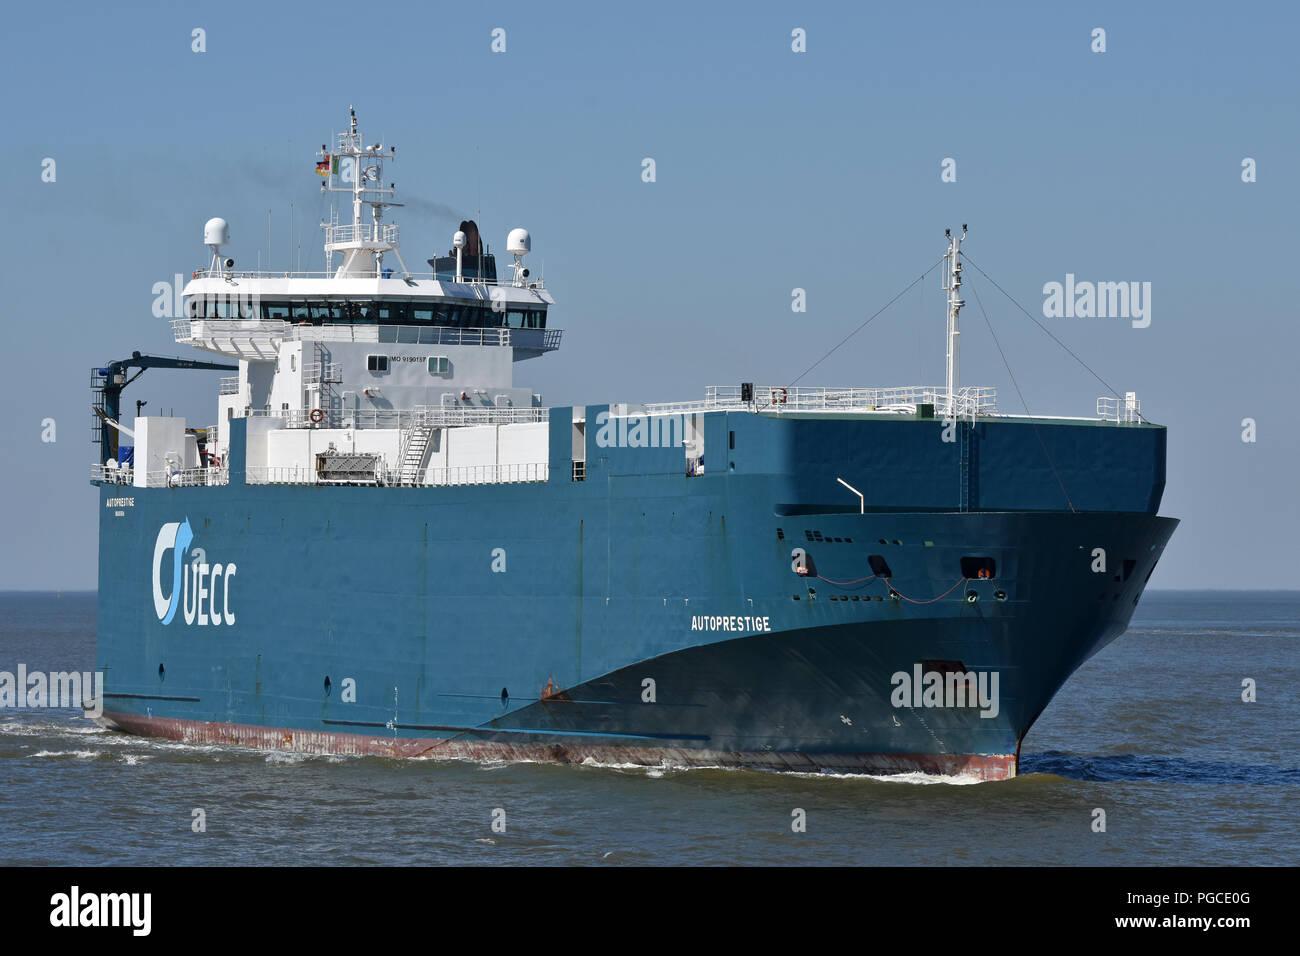 Carcarrier Autoprestige inbound port of CuxhavenStock Photo